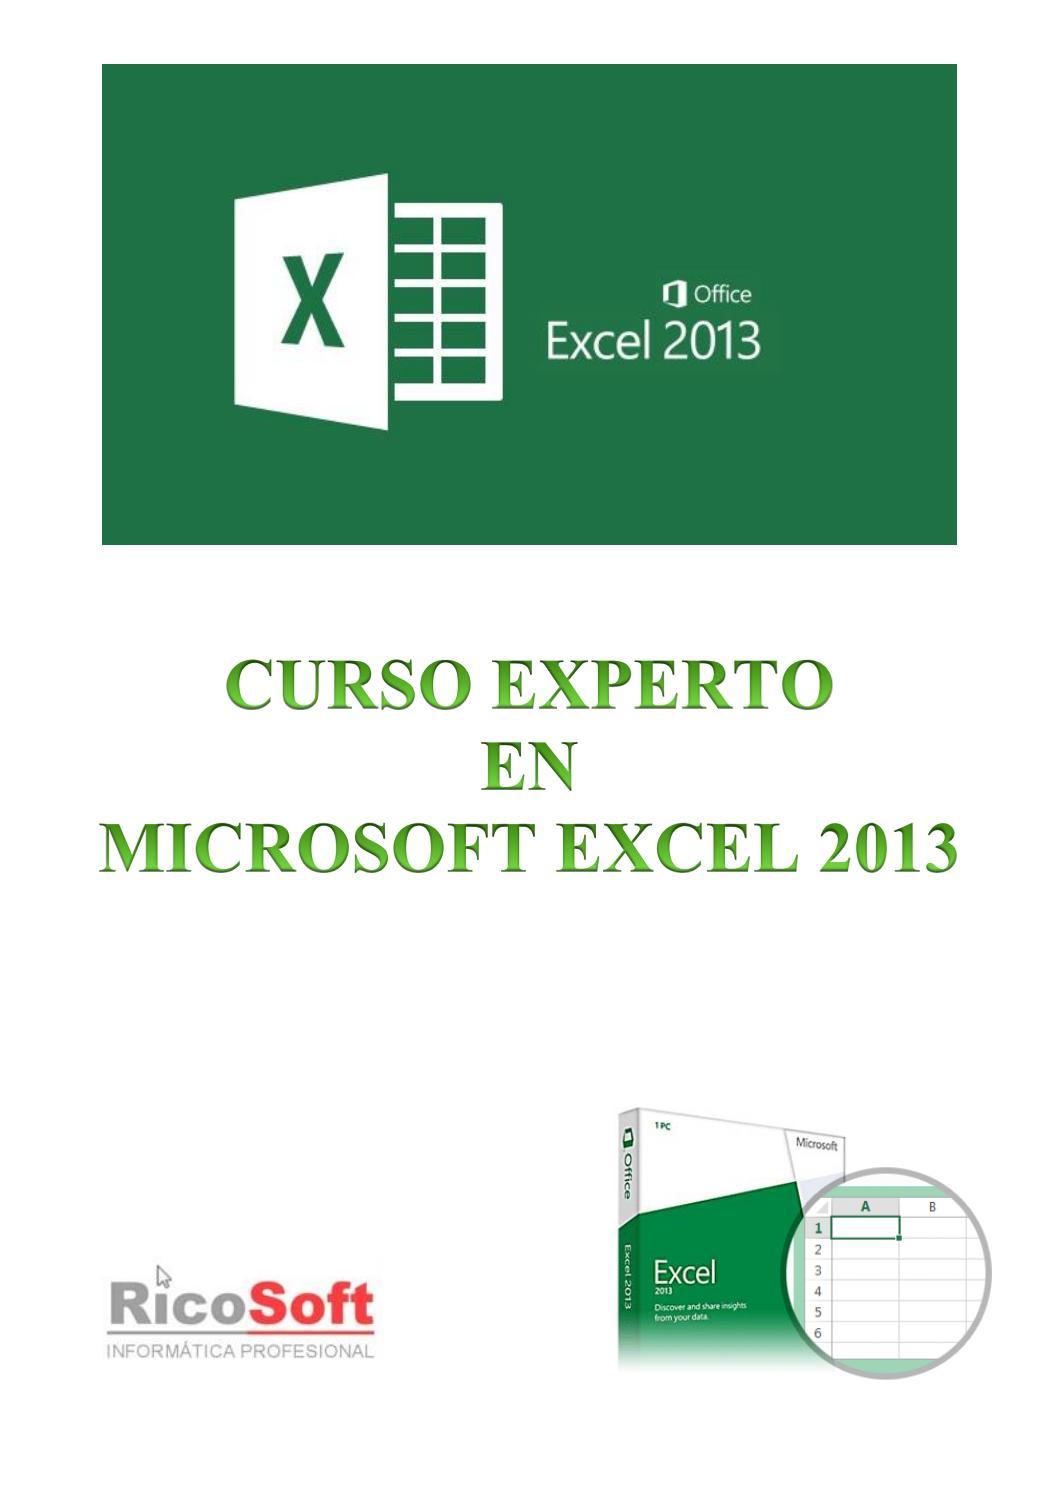 Curso experto microsoft excel 2013 by L. A. Estrada - issuu